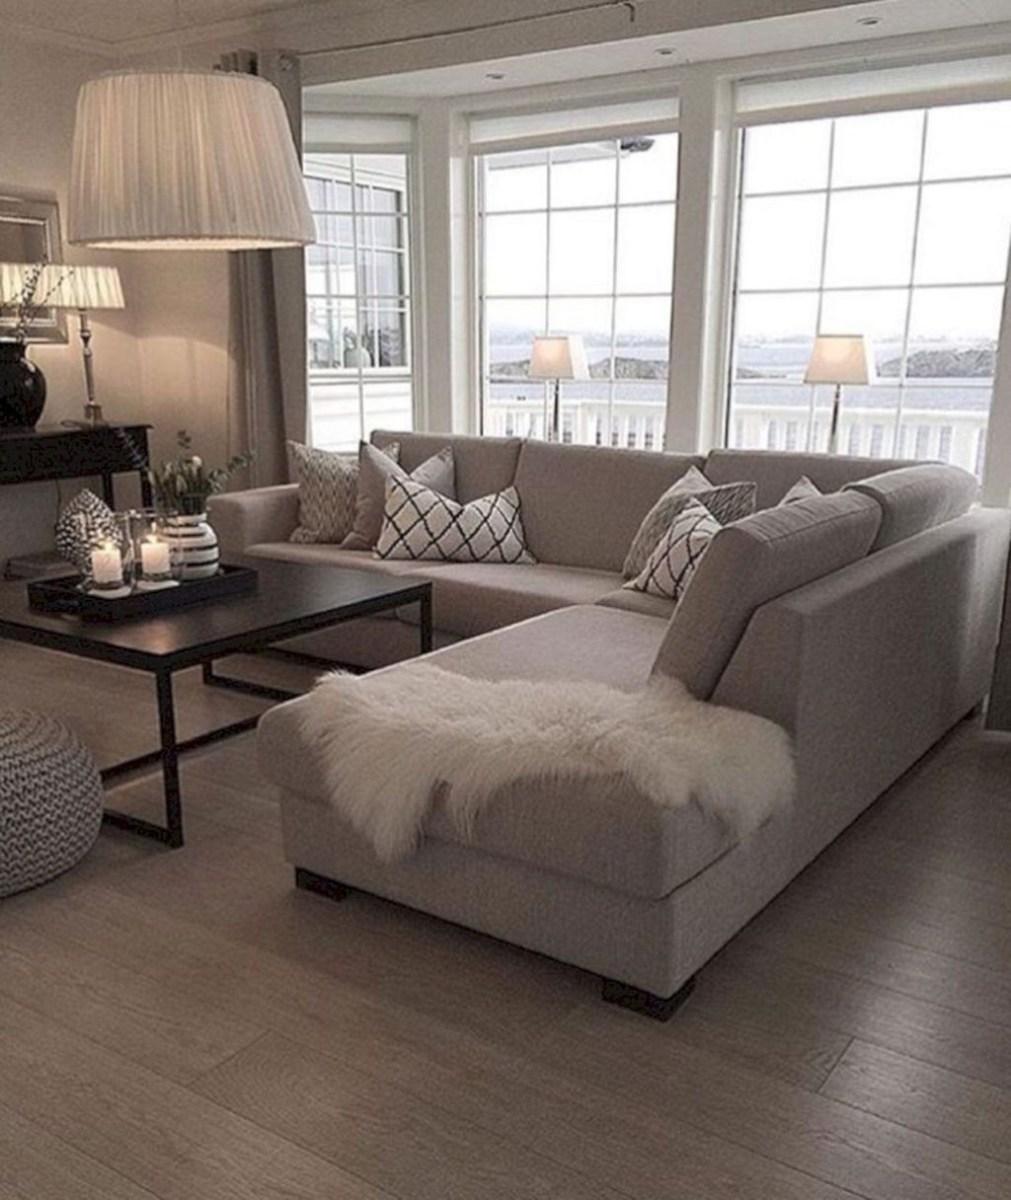 Magnificient Living Room Decor Ideas For Your Apartment 36